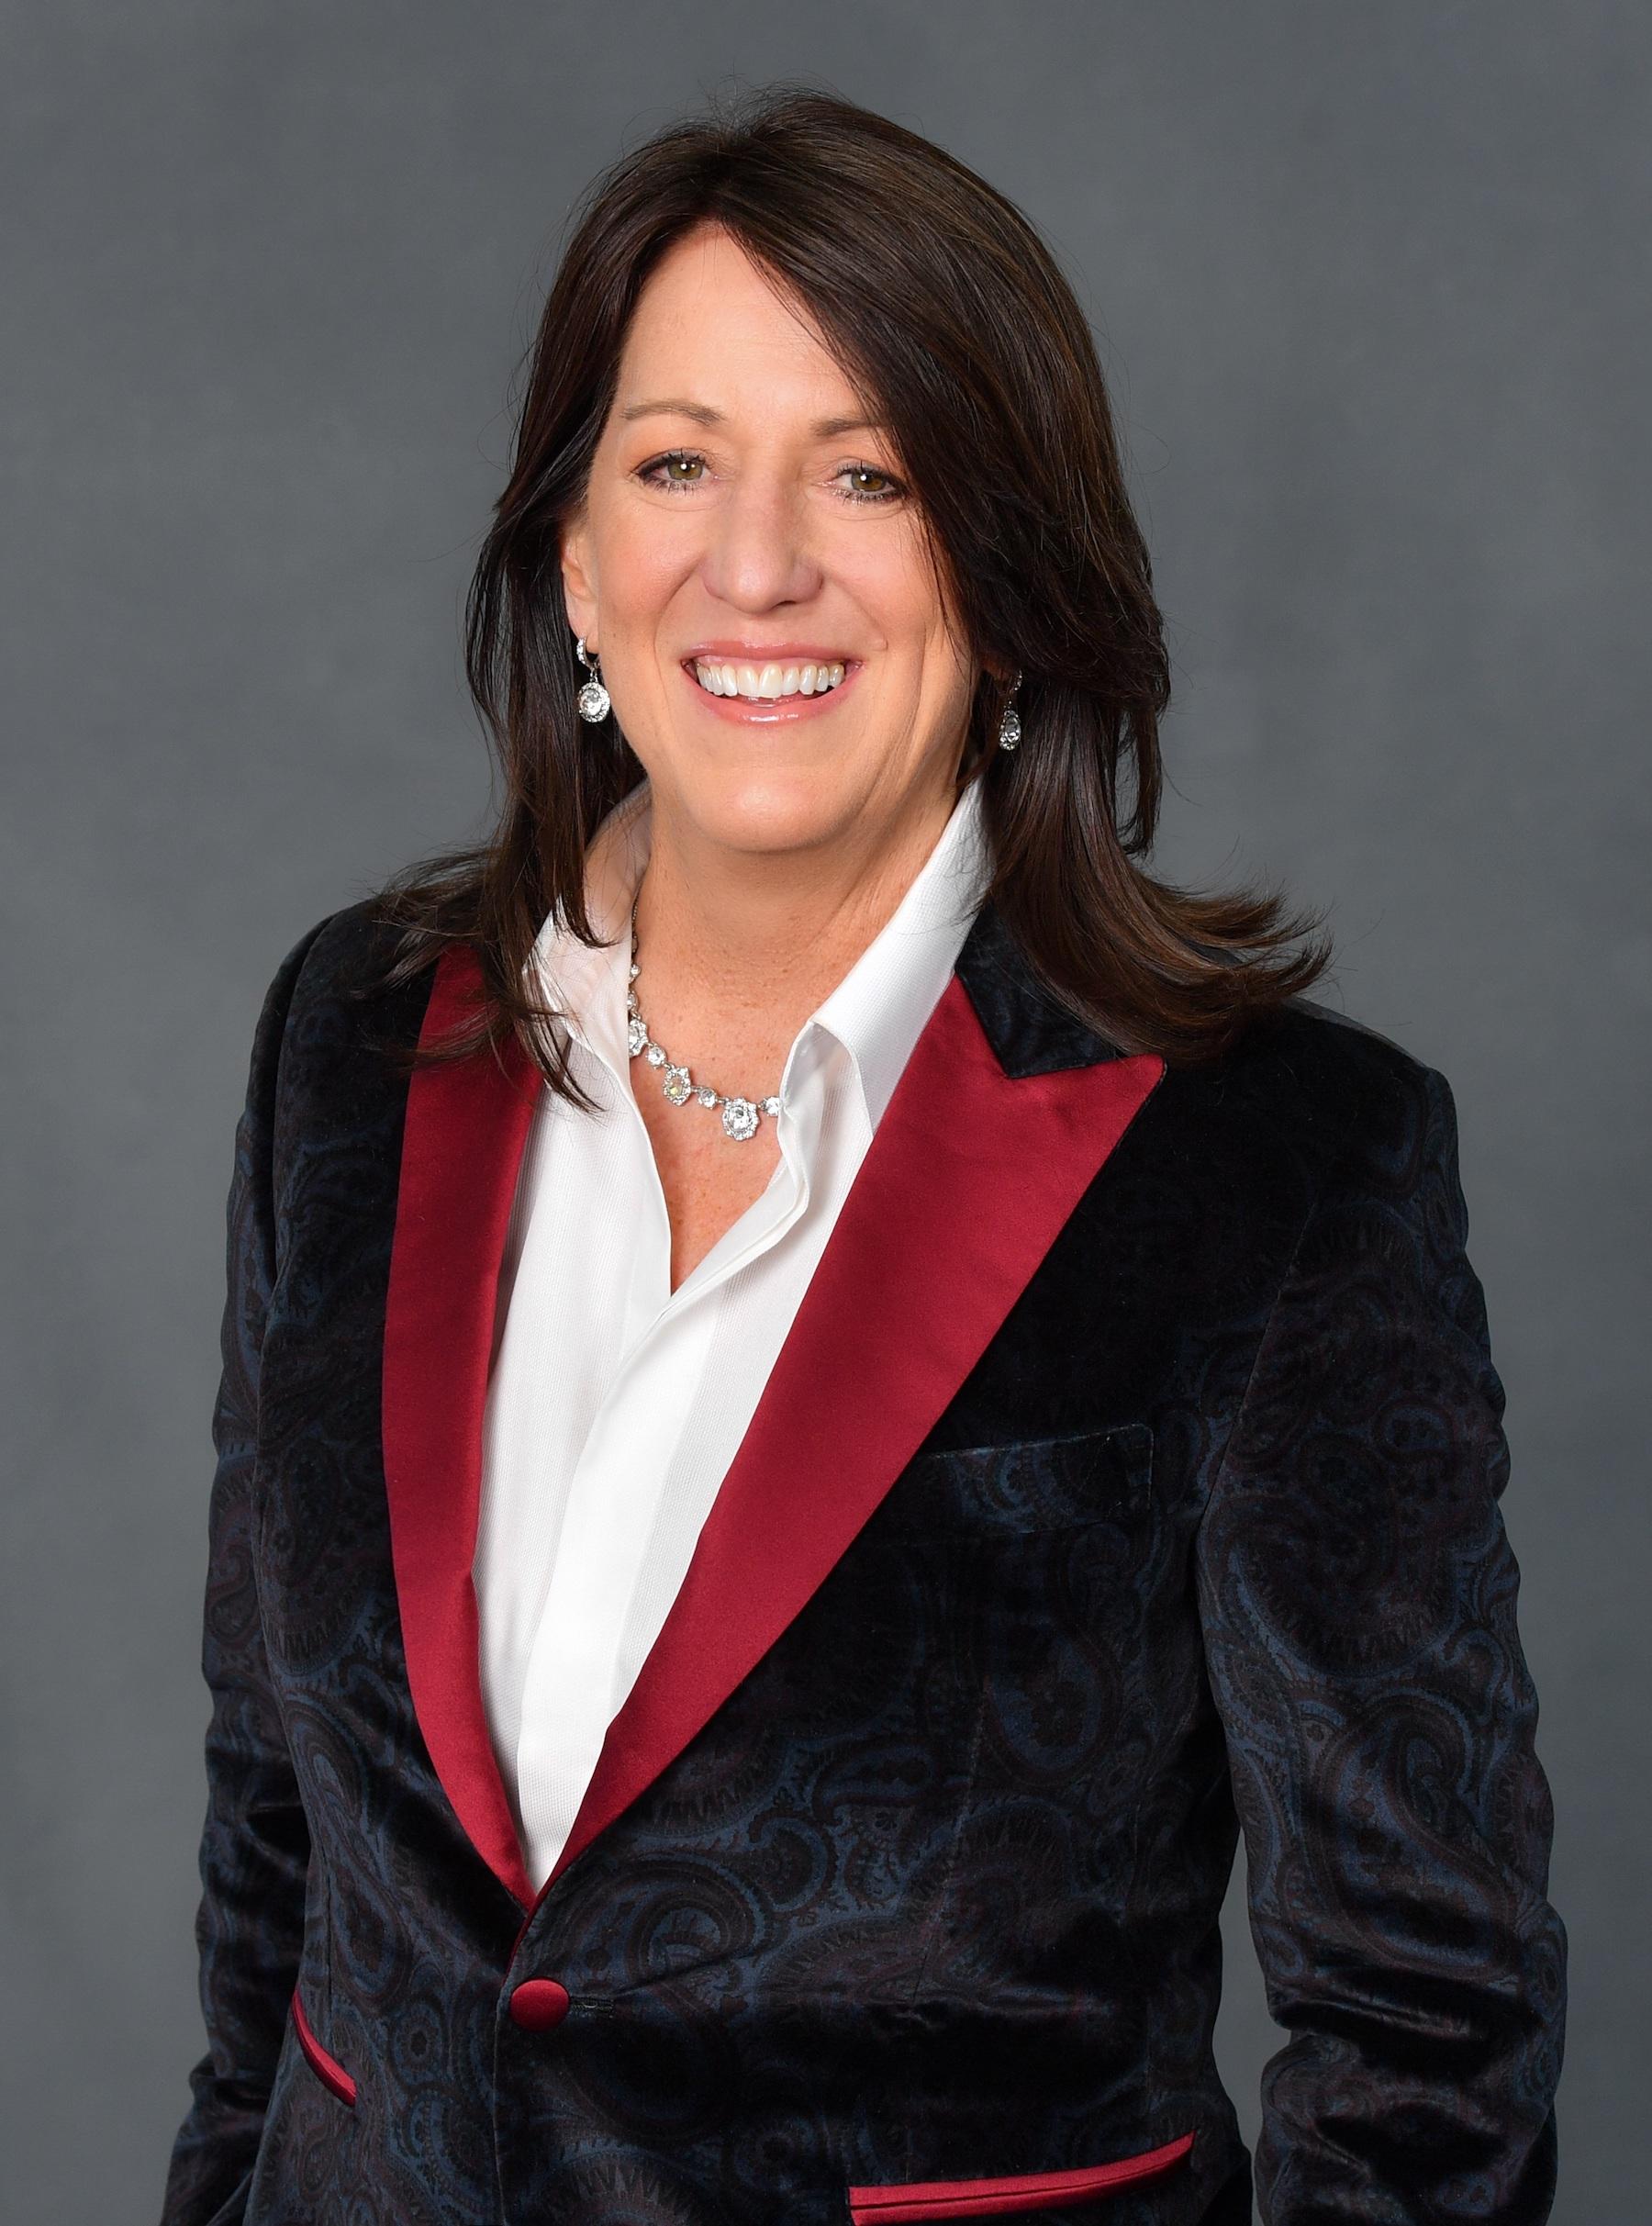 Kate Kendell, NCLR